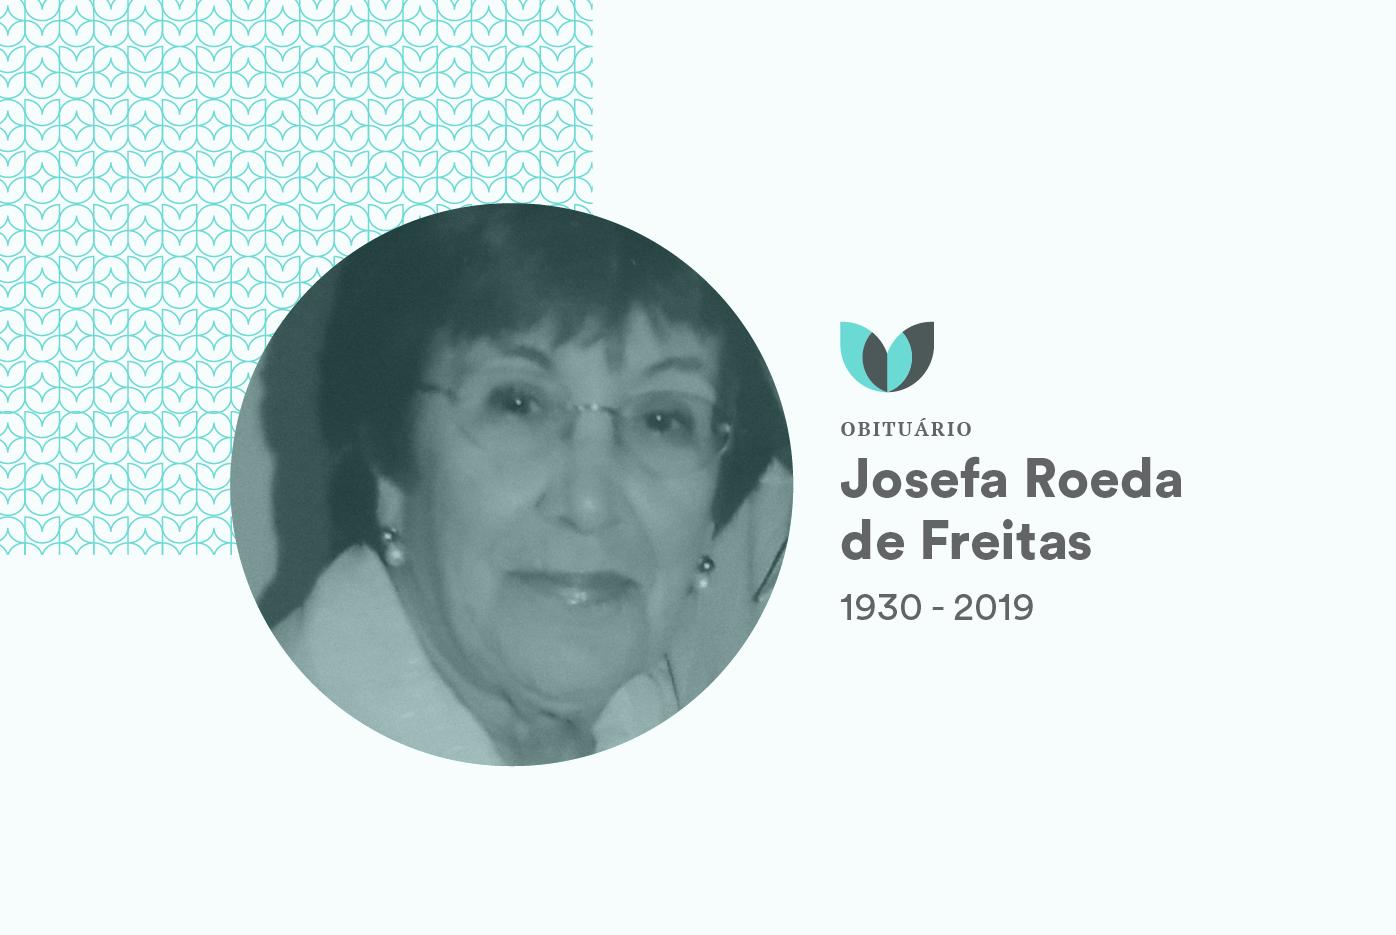 Obituario-Josefa-Squarespace.png